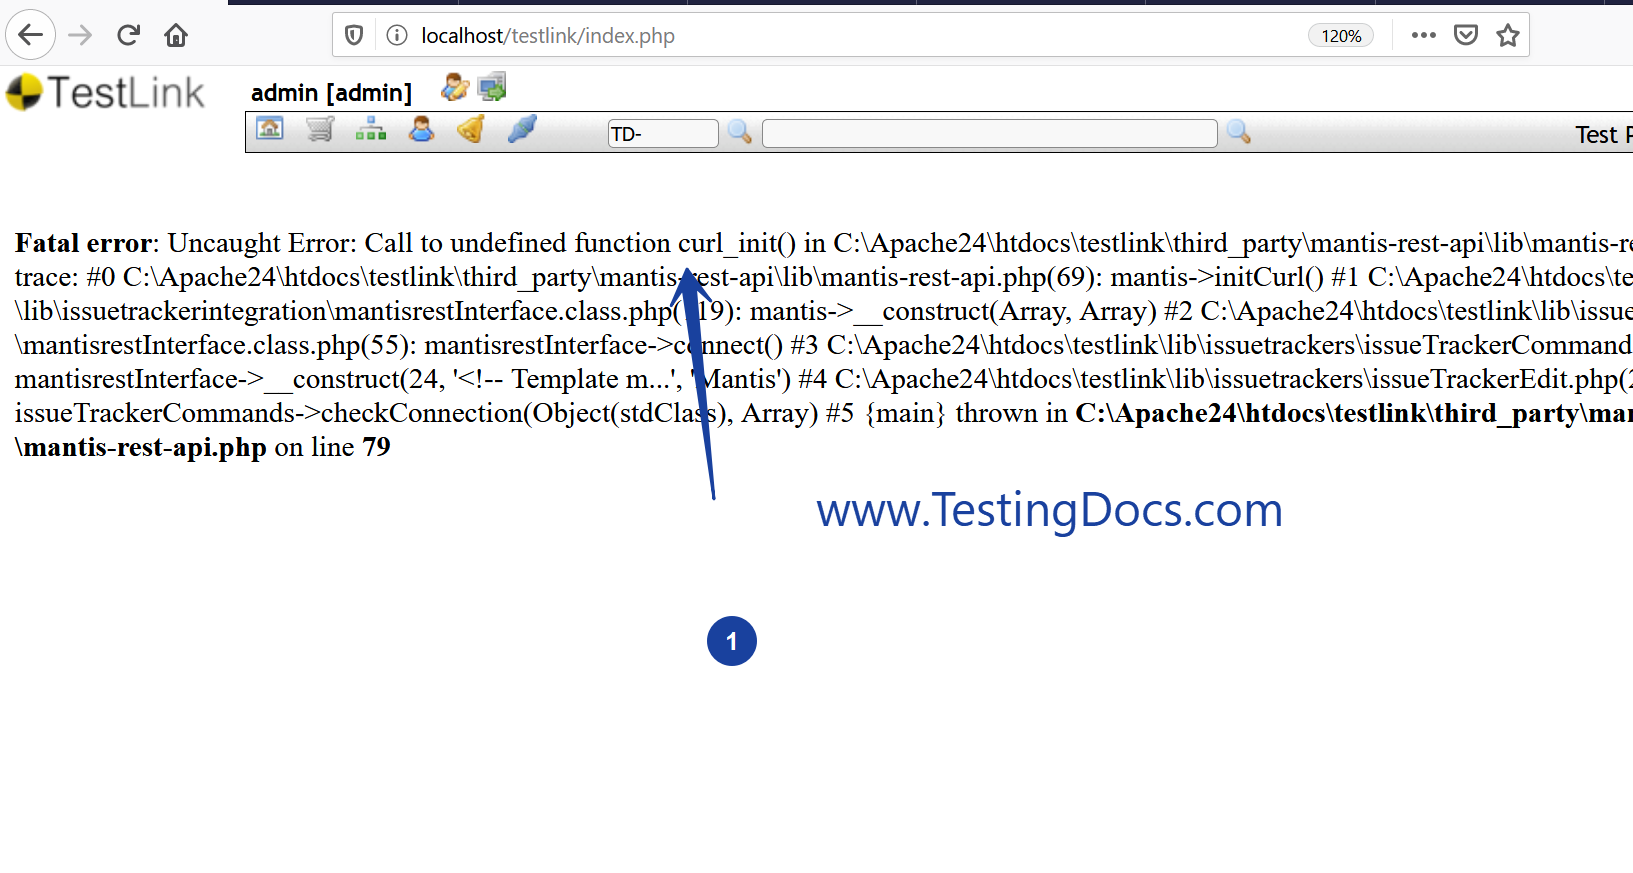 Fatal error curl_init()